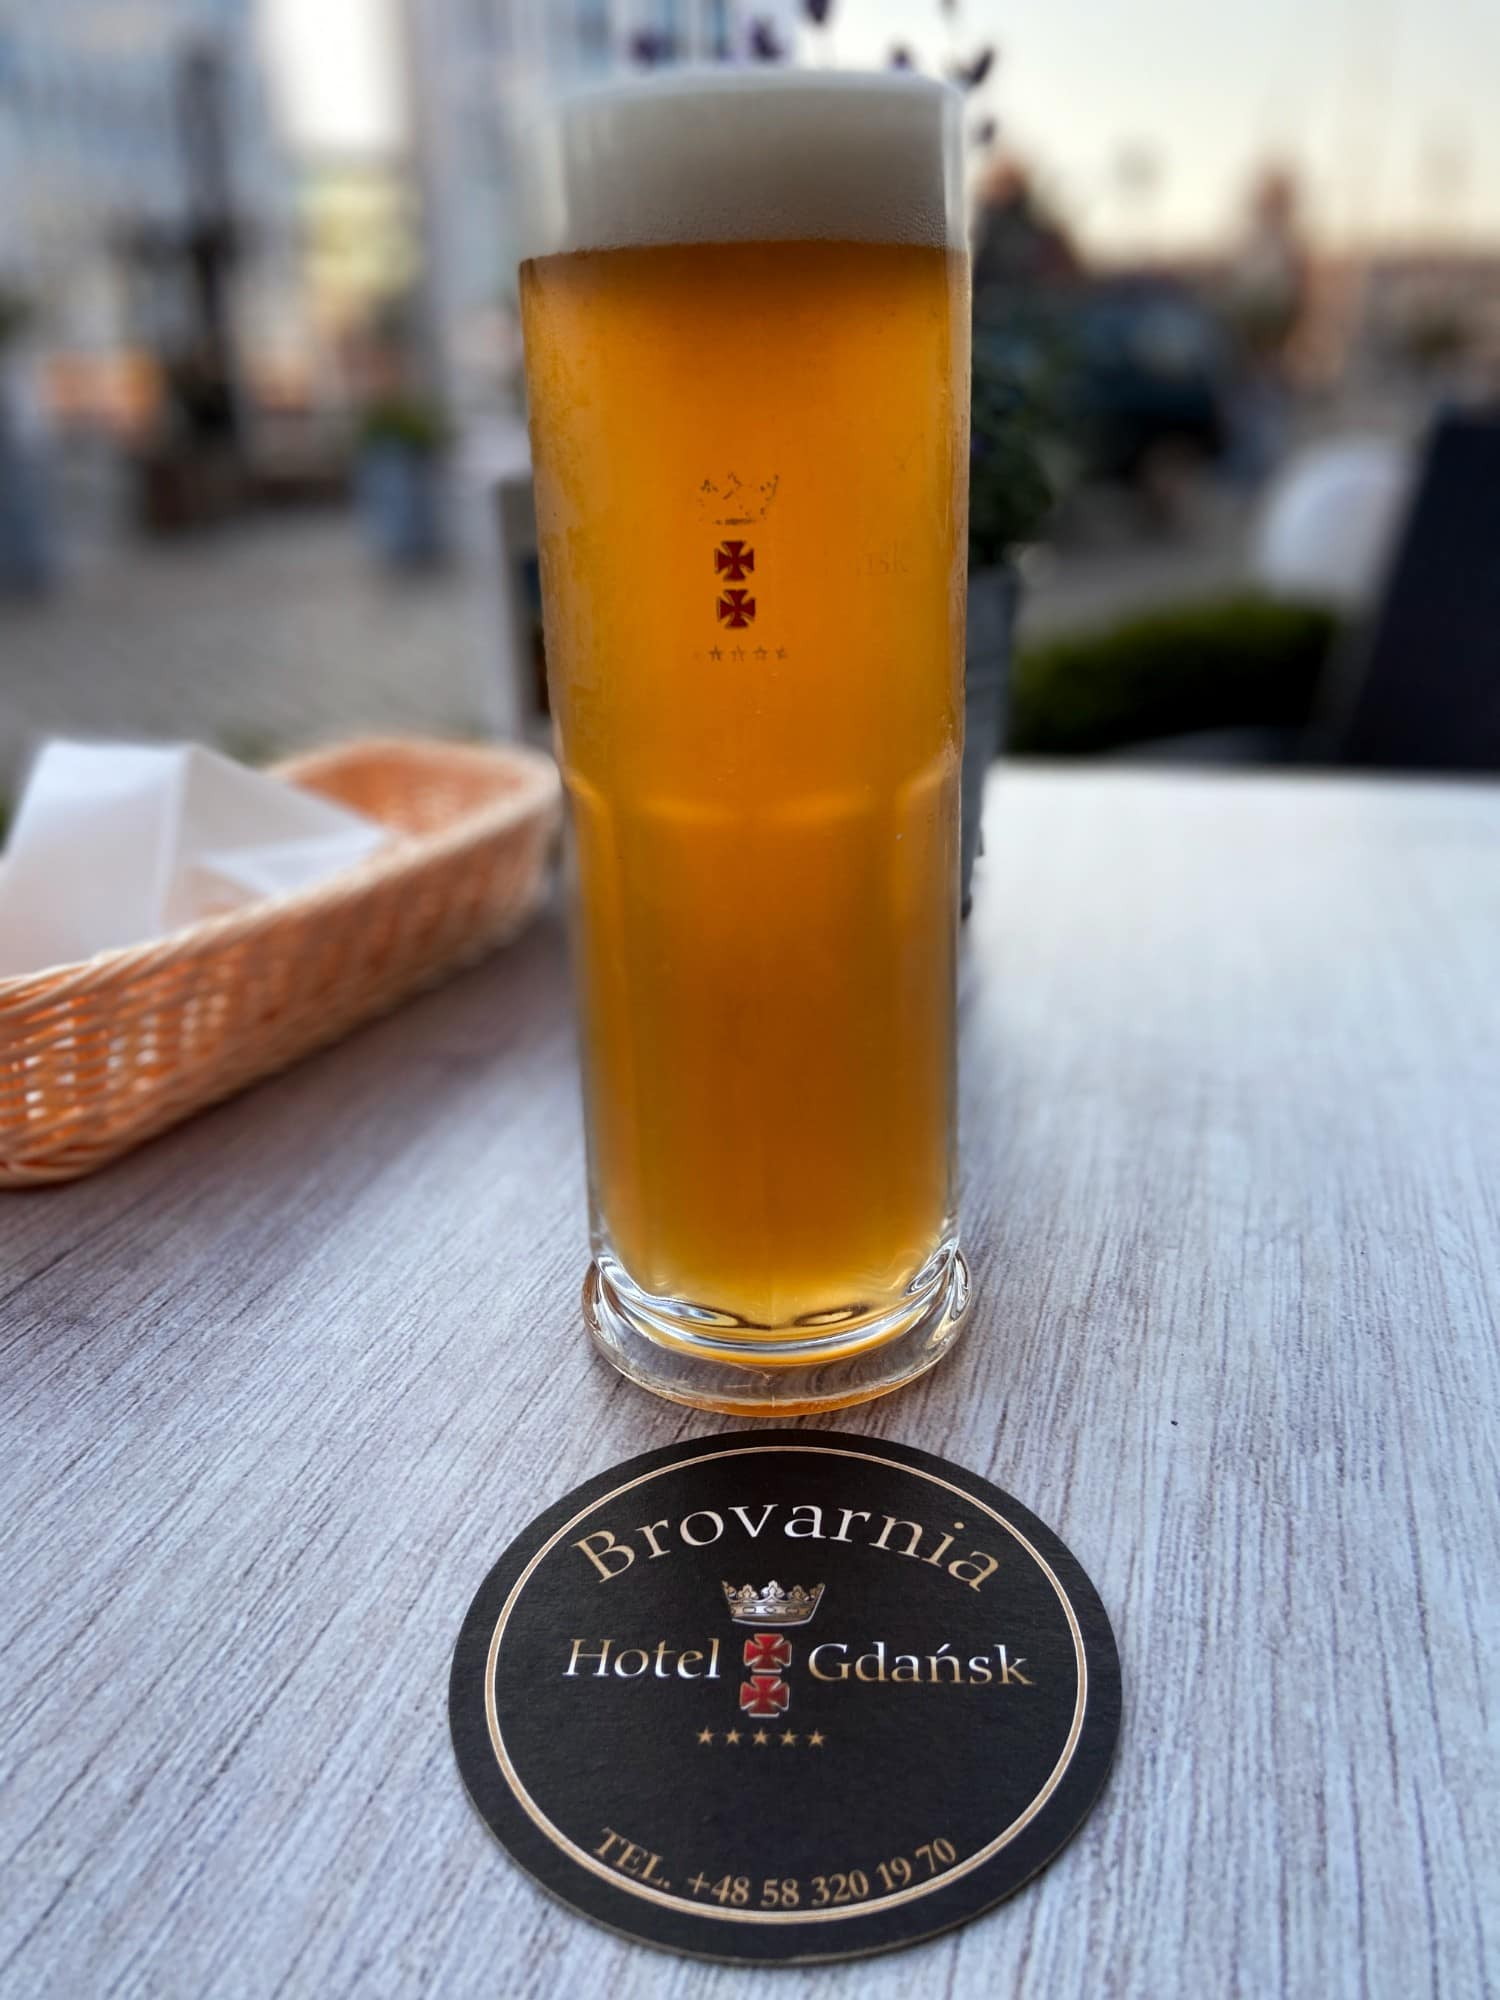 Browarnia Gdansk